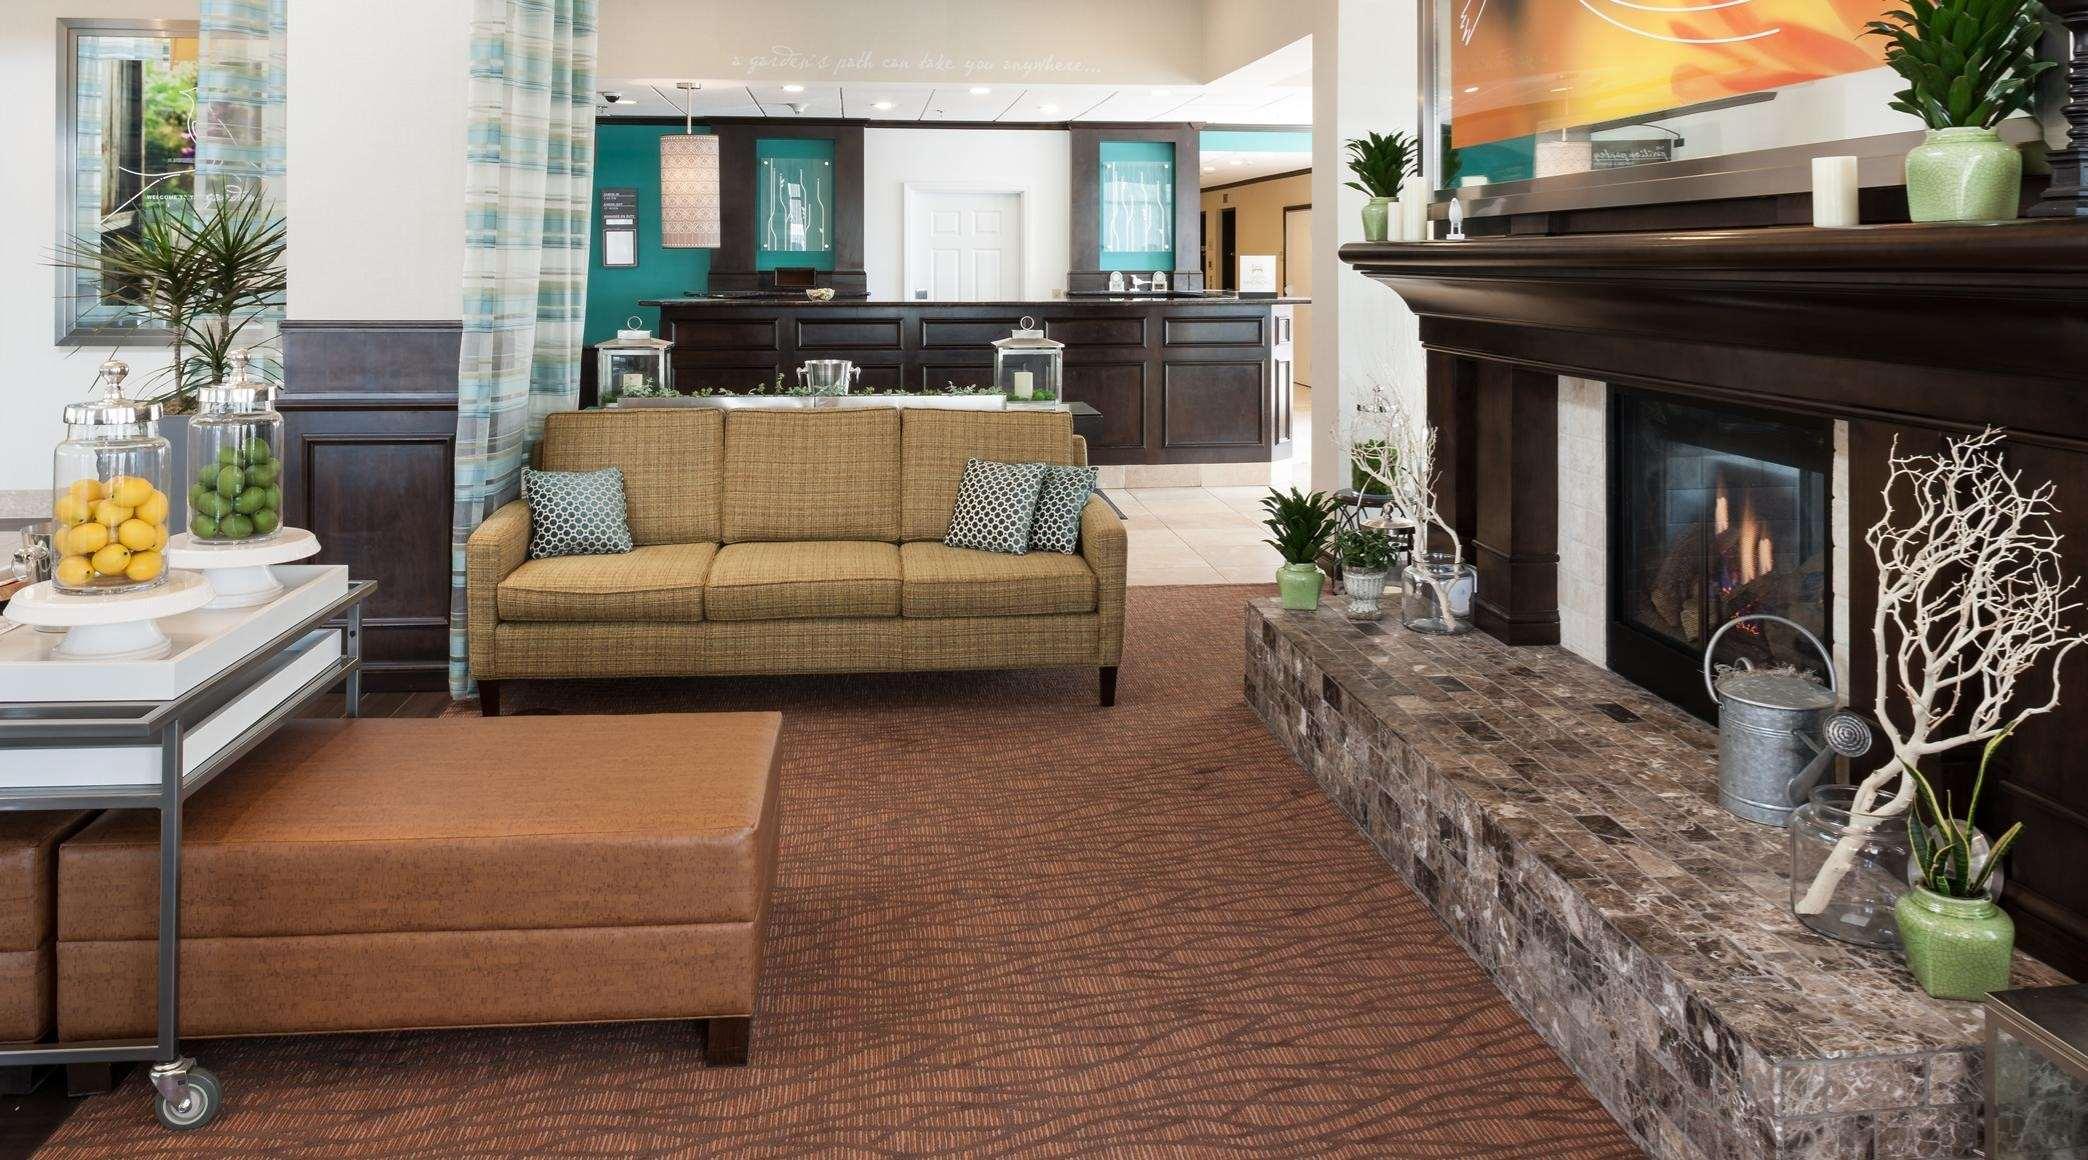 Hilton Garden Inn Denver/Highlands Ranch image 23